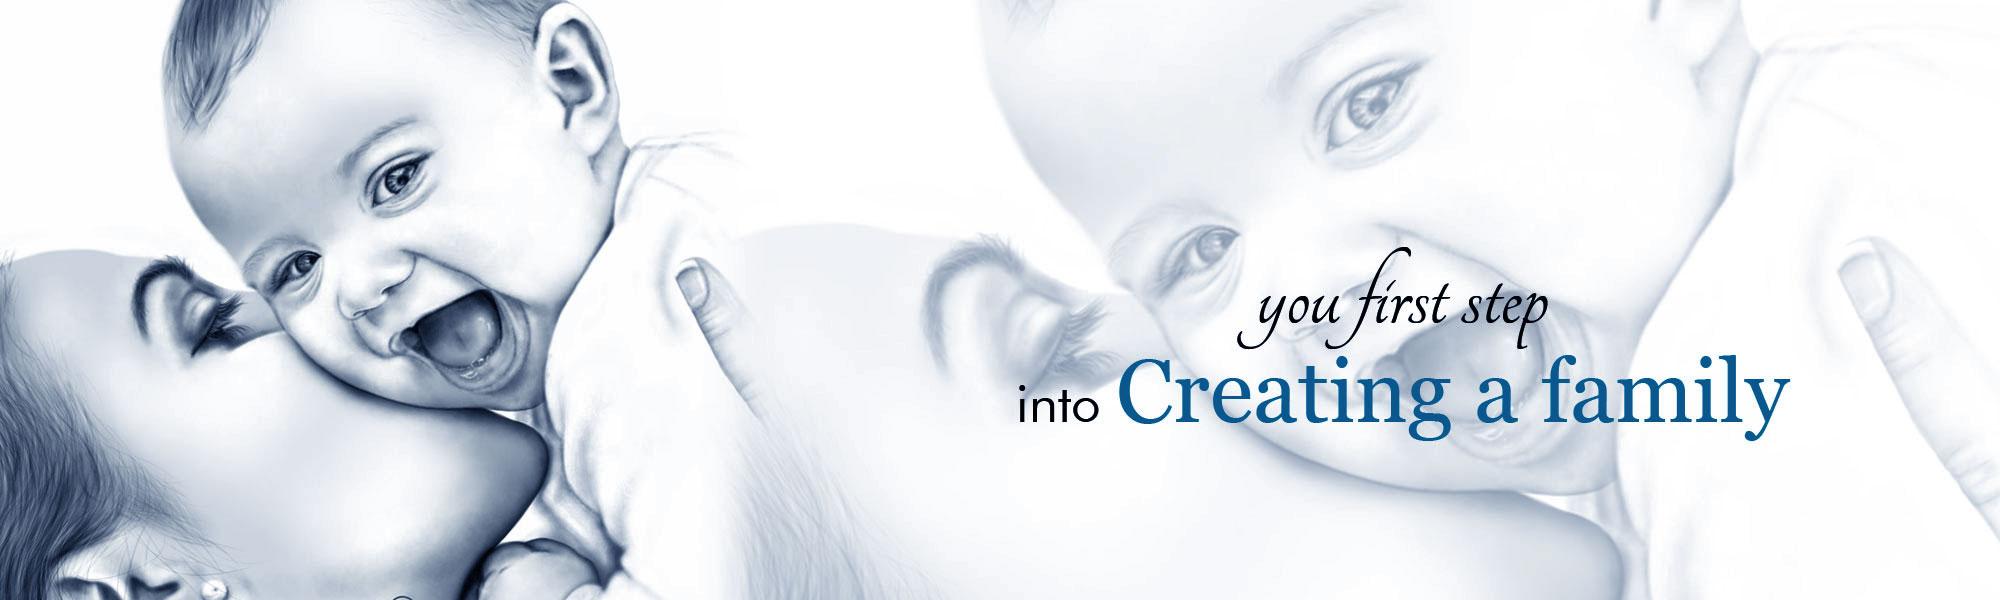 fertility centre delhi